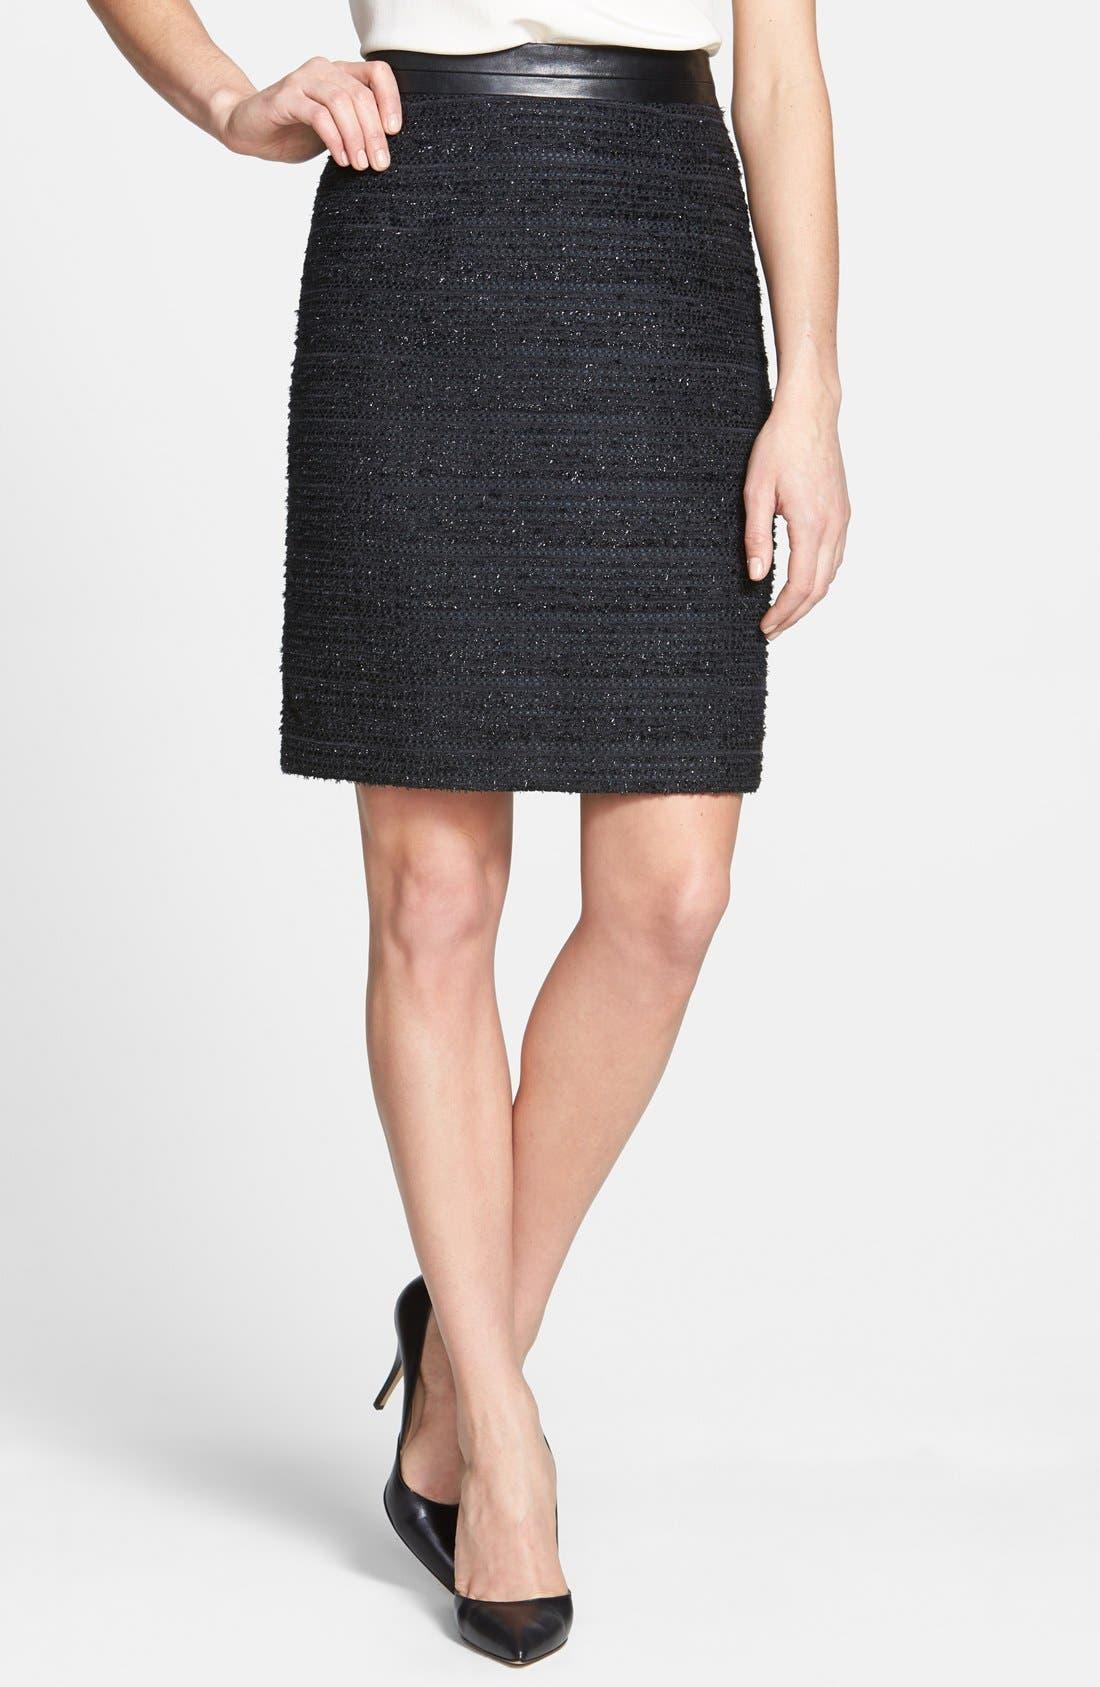 Alternate Image 1 Selected - Milly Metallic Tweed & Leather Pencil Skirt